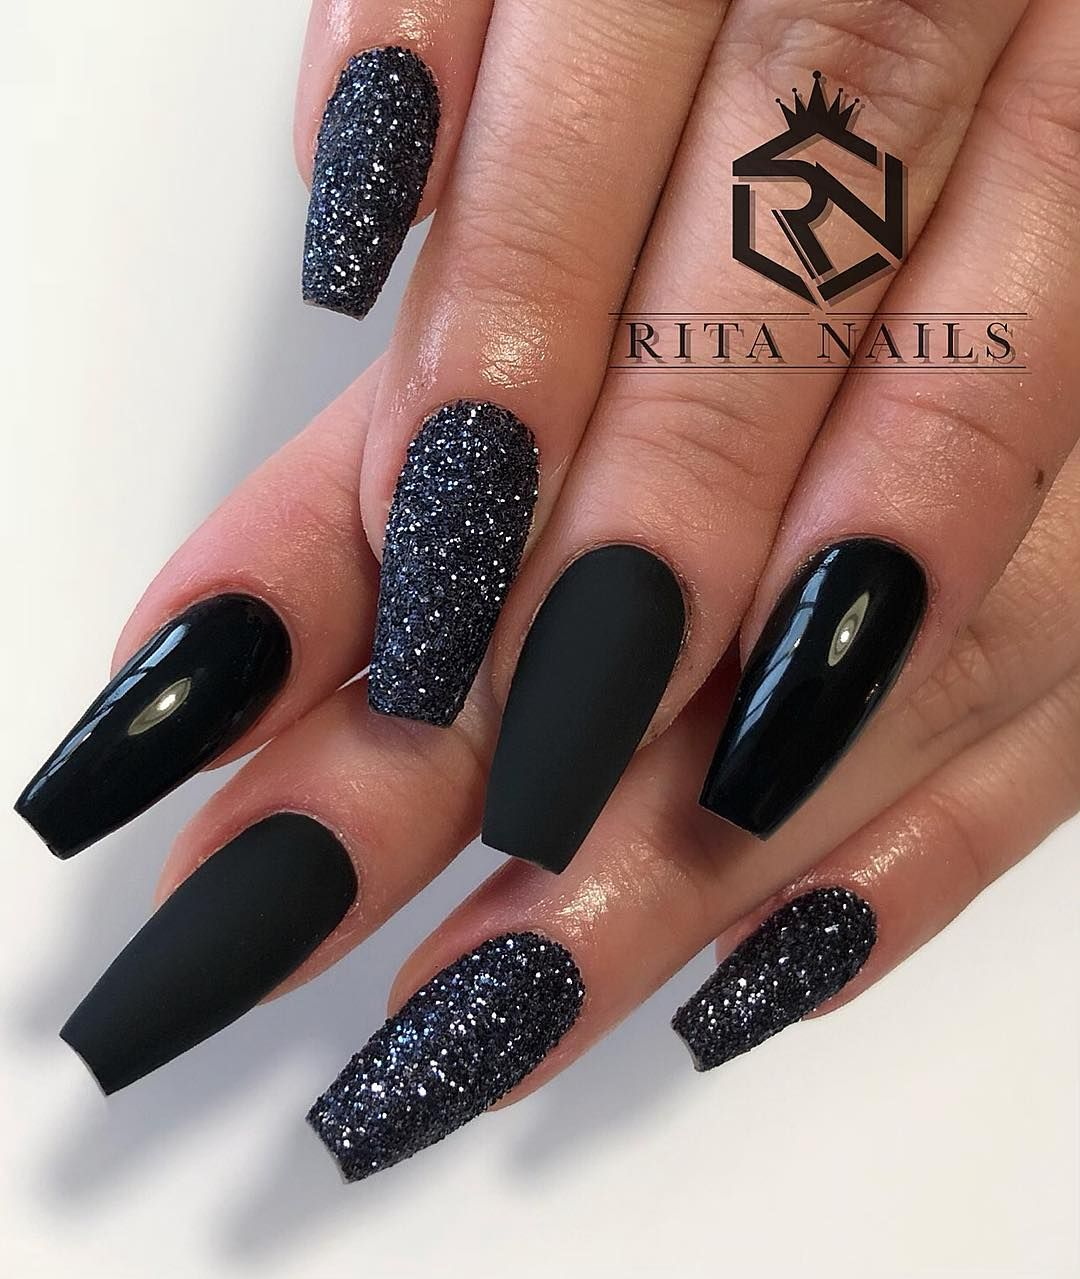 Nailstylist Ballerinanails Zurich Nailsswag Nails Nailstagram Naildesign Blacknails Black Acrylic Nails Coffin Nails Designs Black Nails With Glitter